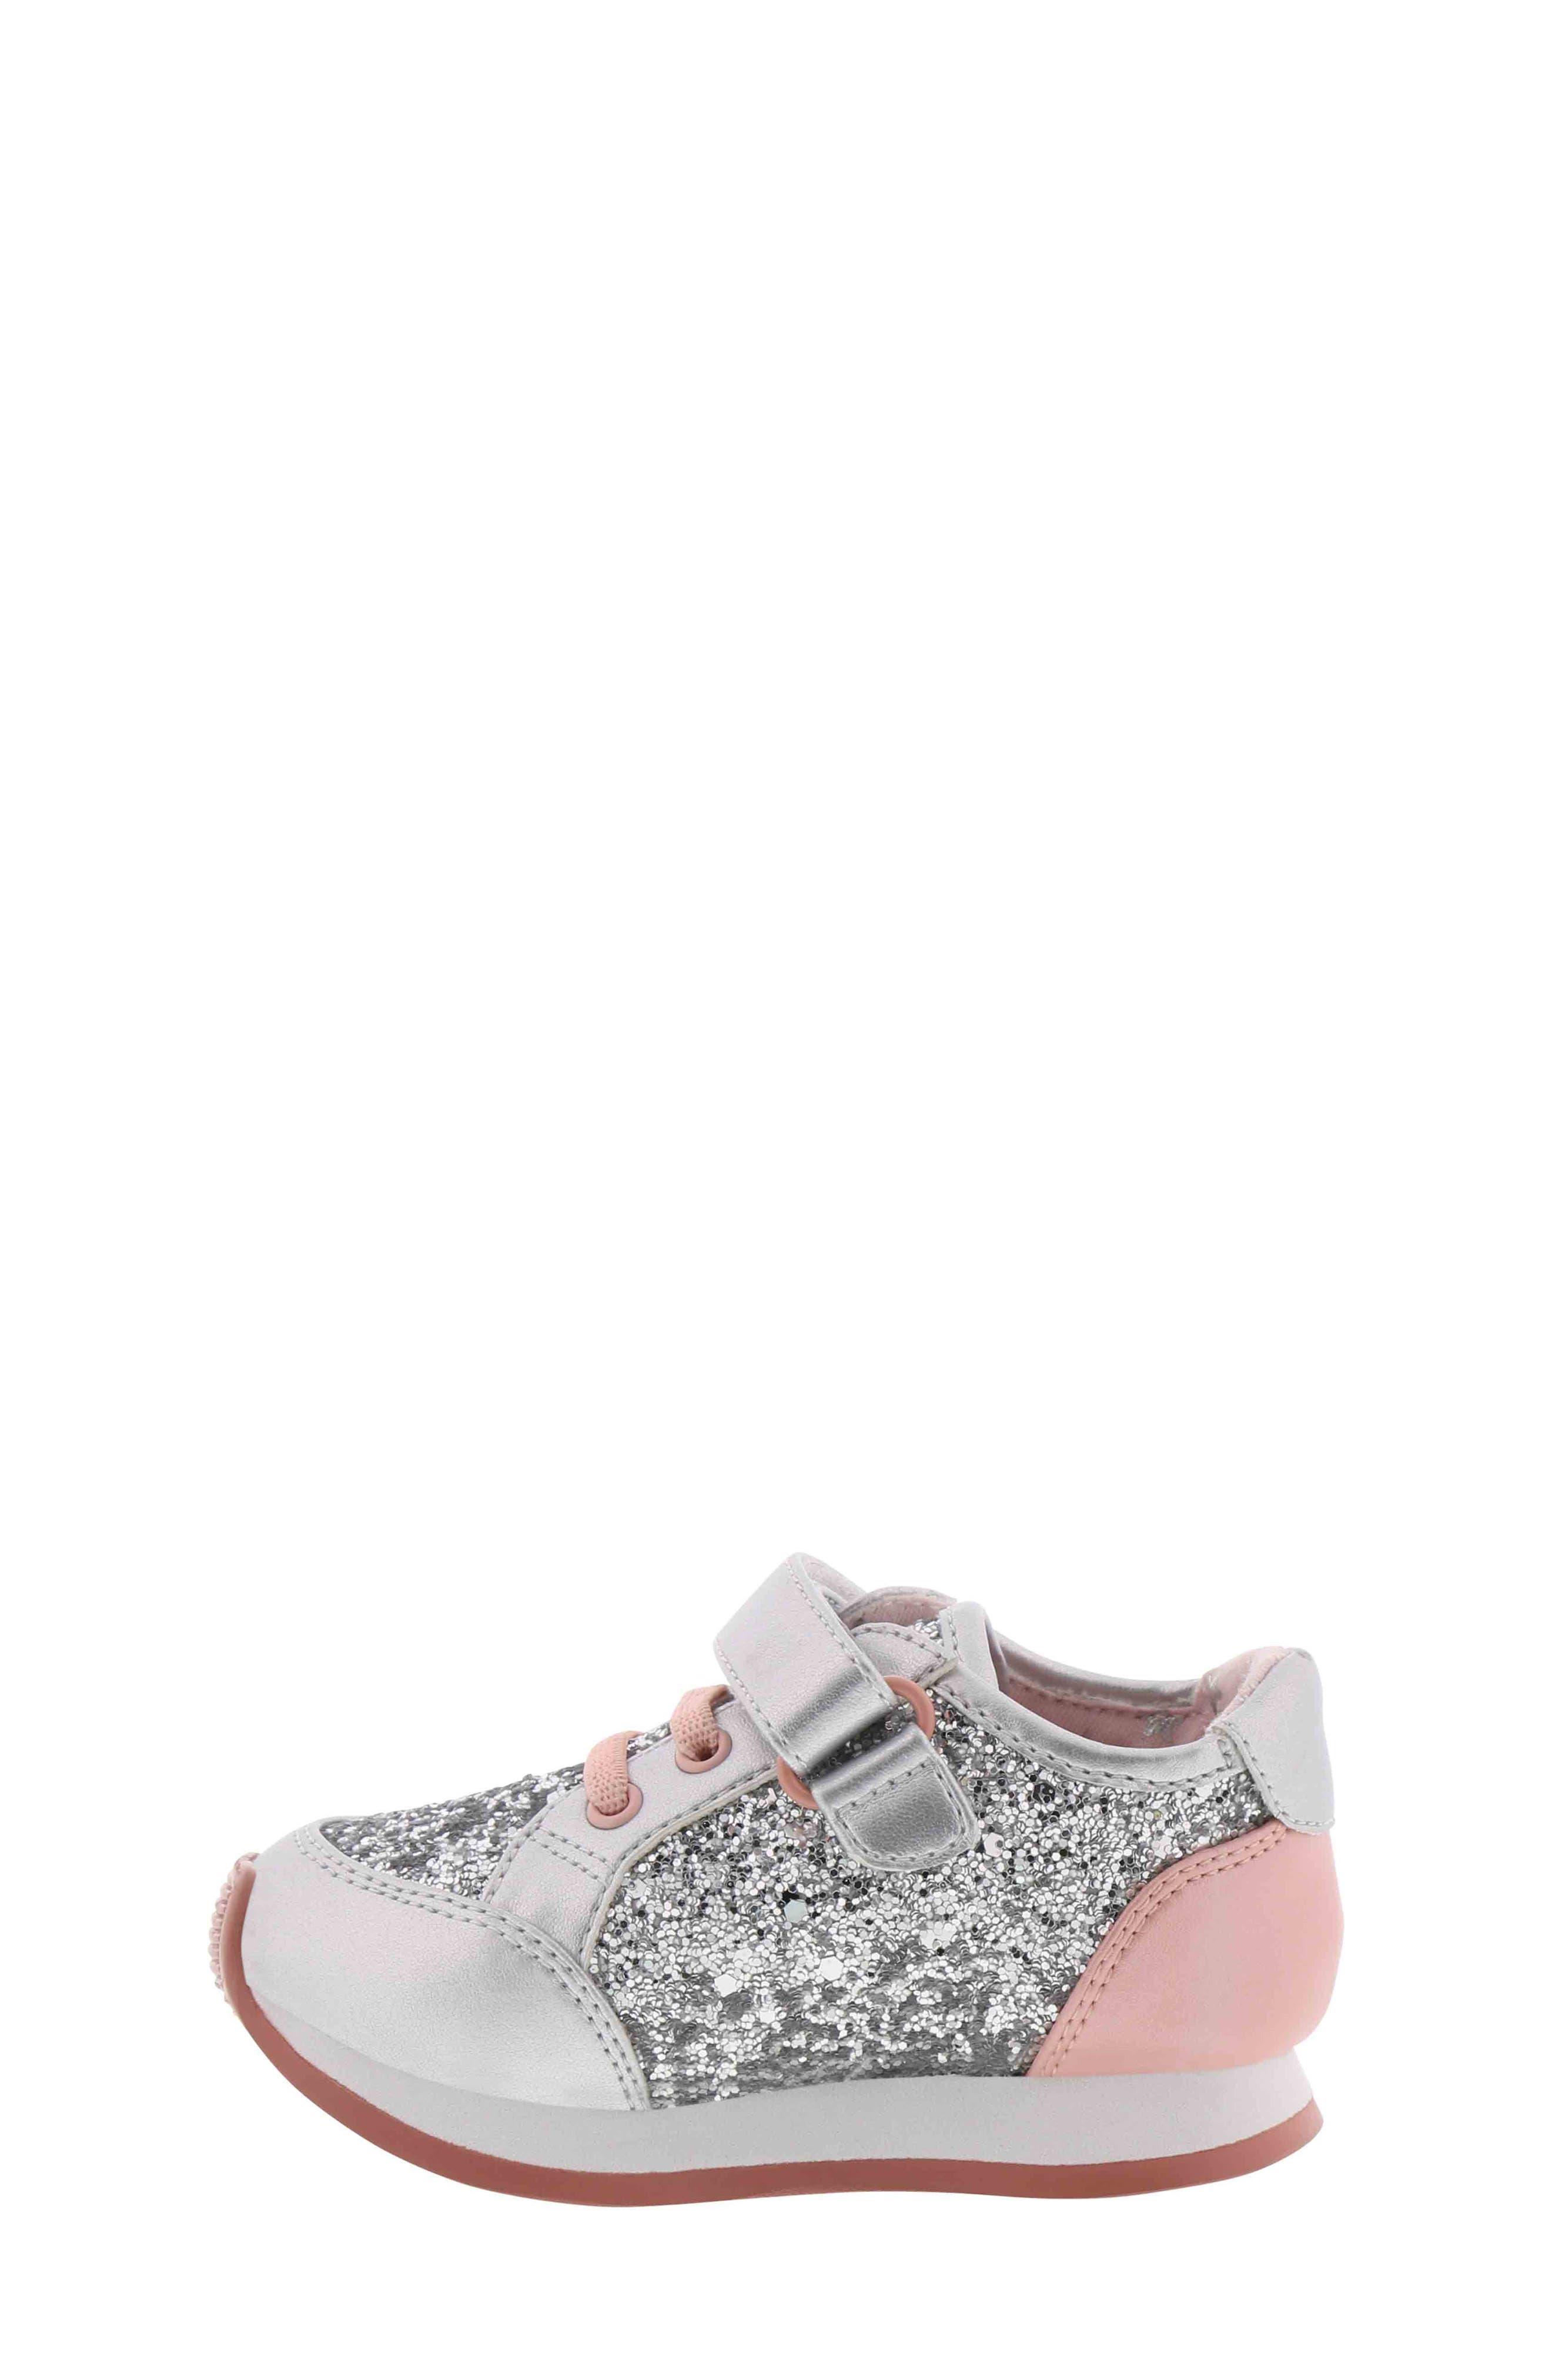 BØRN,                             Adyson Margyne Sparkle Sneaker,                             Alternate thumbnail 8, color,                             SILVER PINK